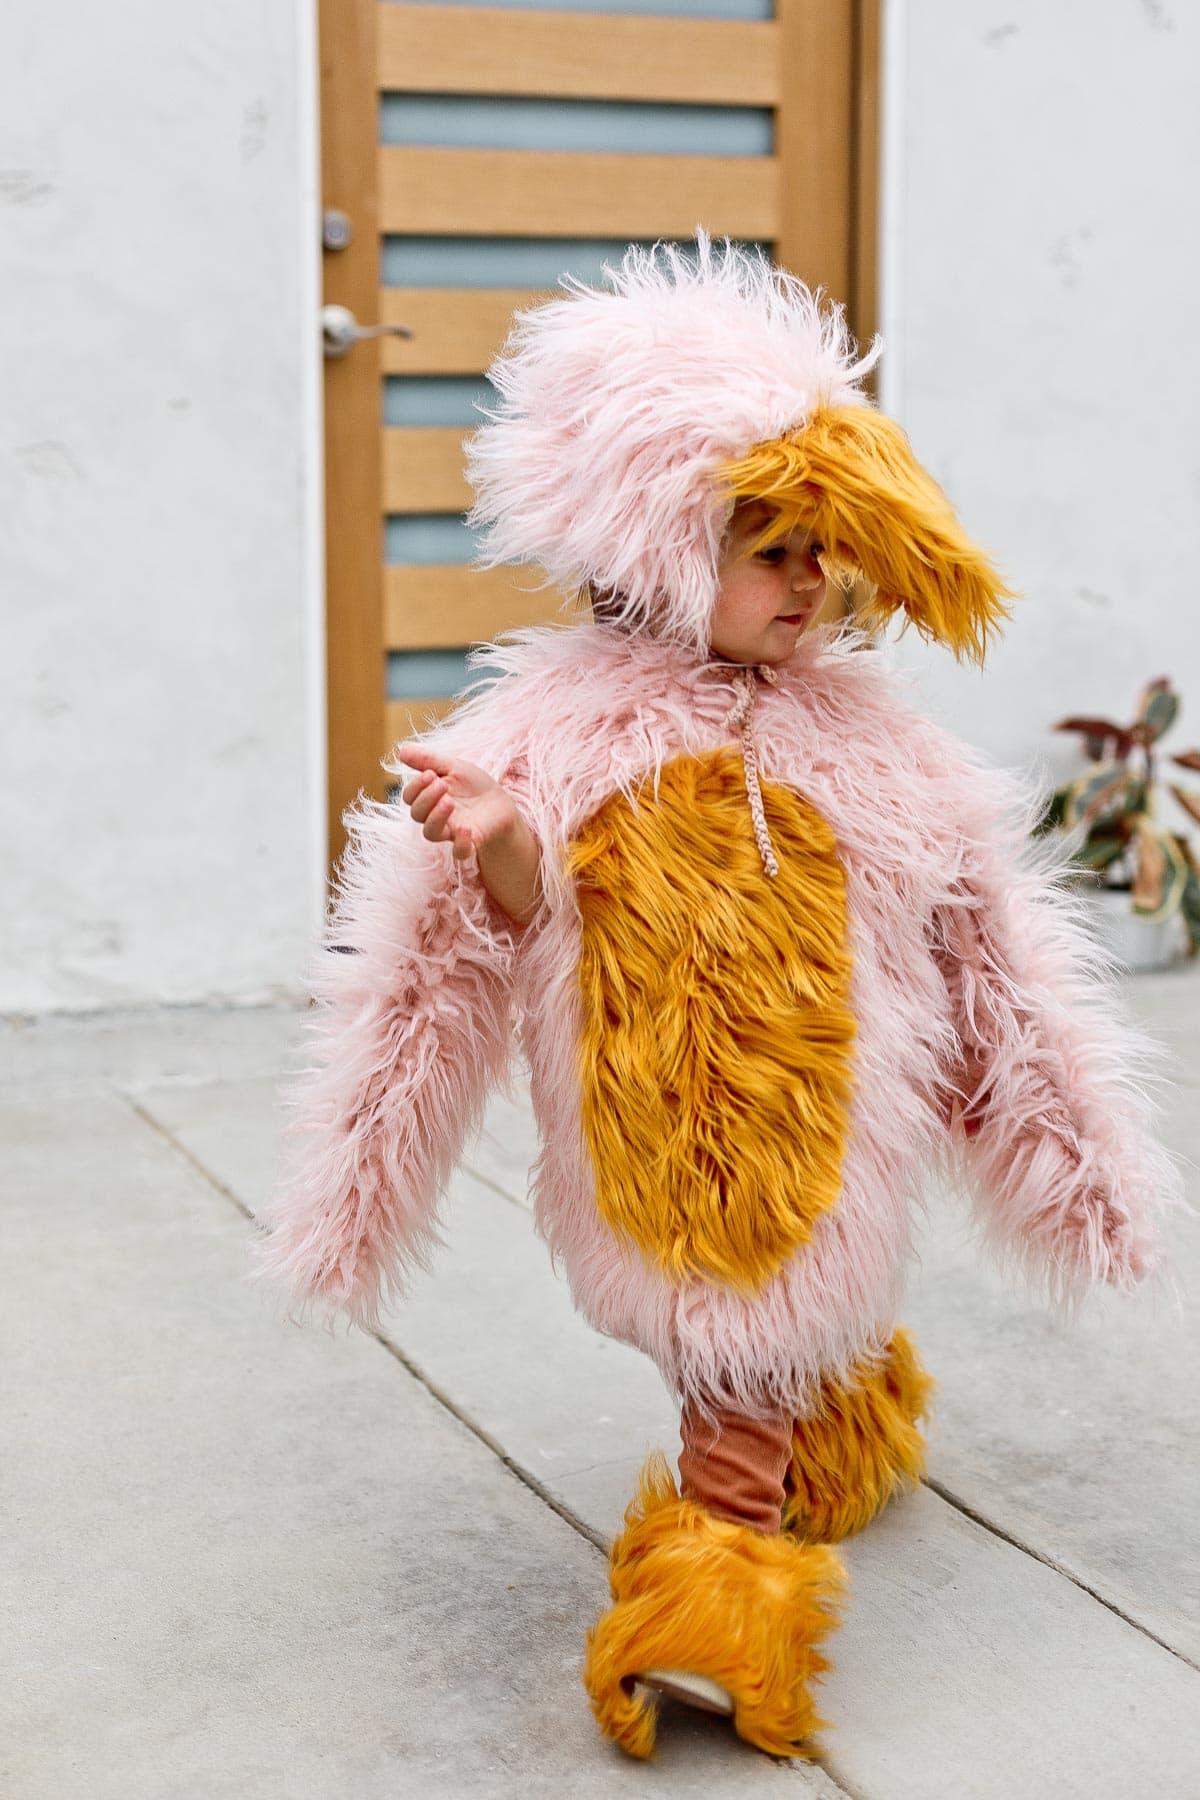 Child wearing pink kids bird costume for Halloween, walking.